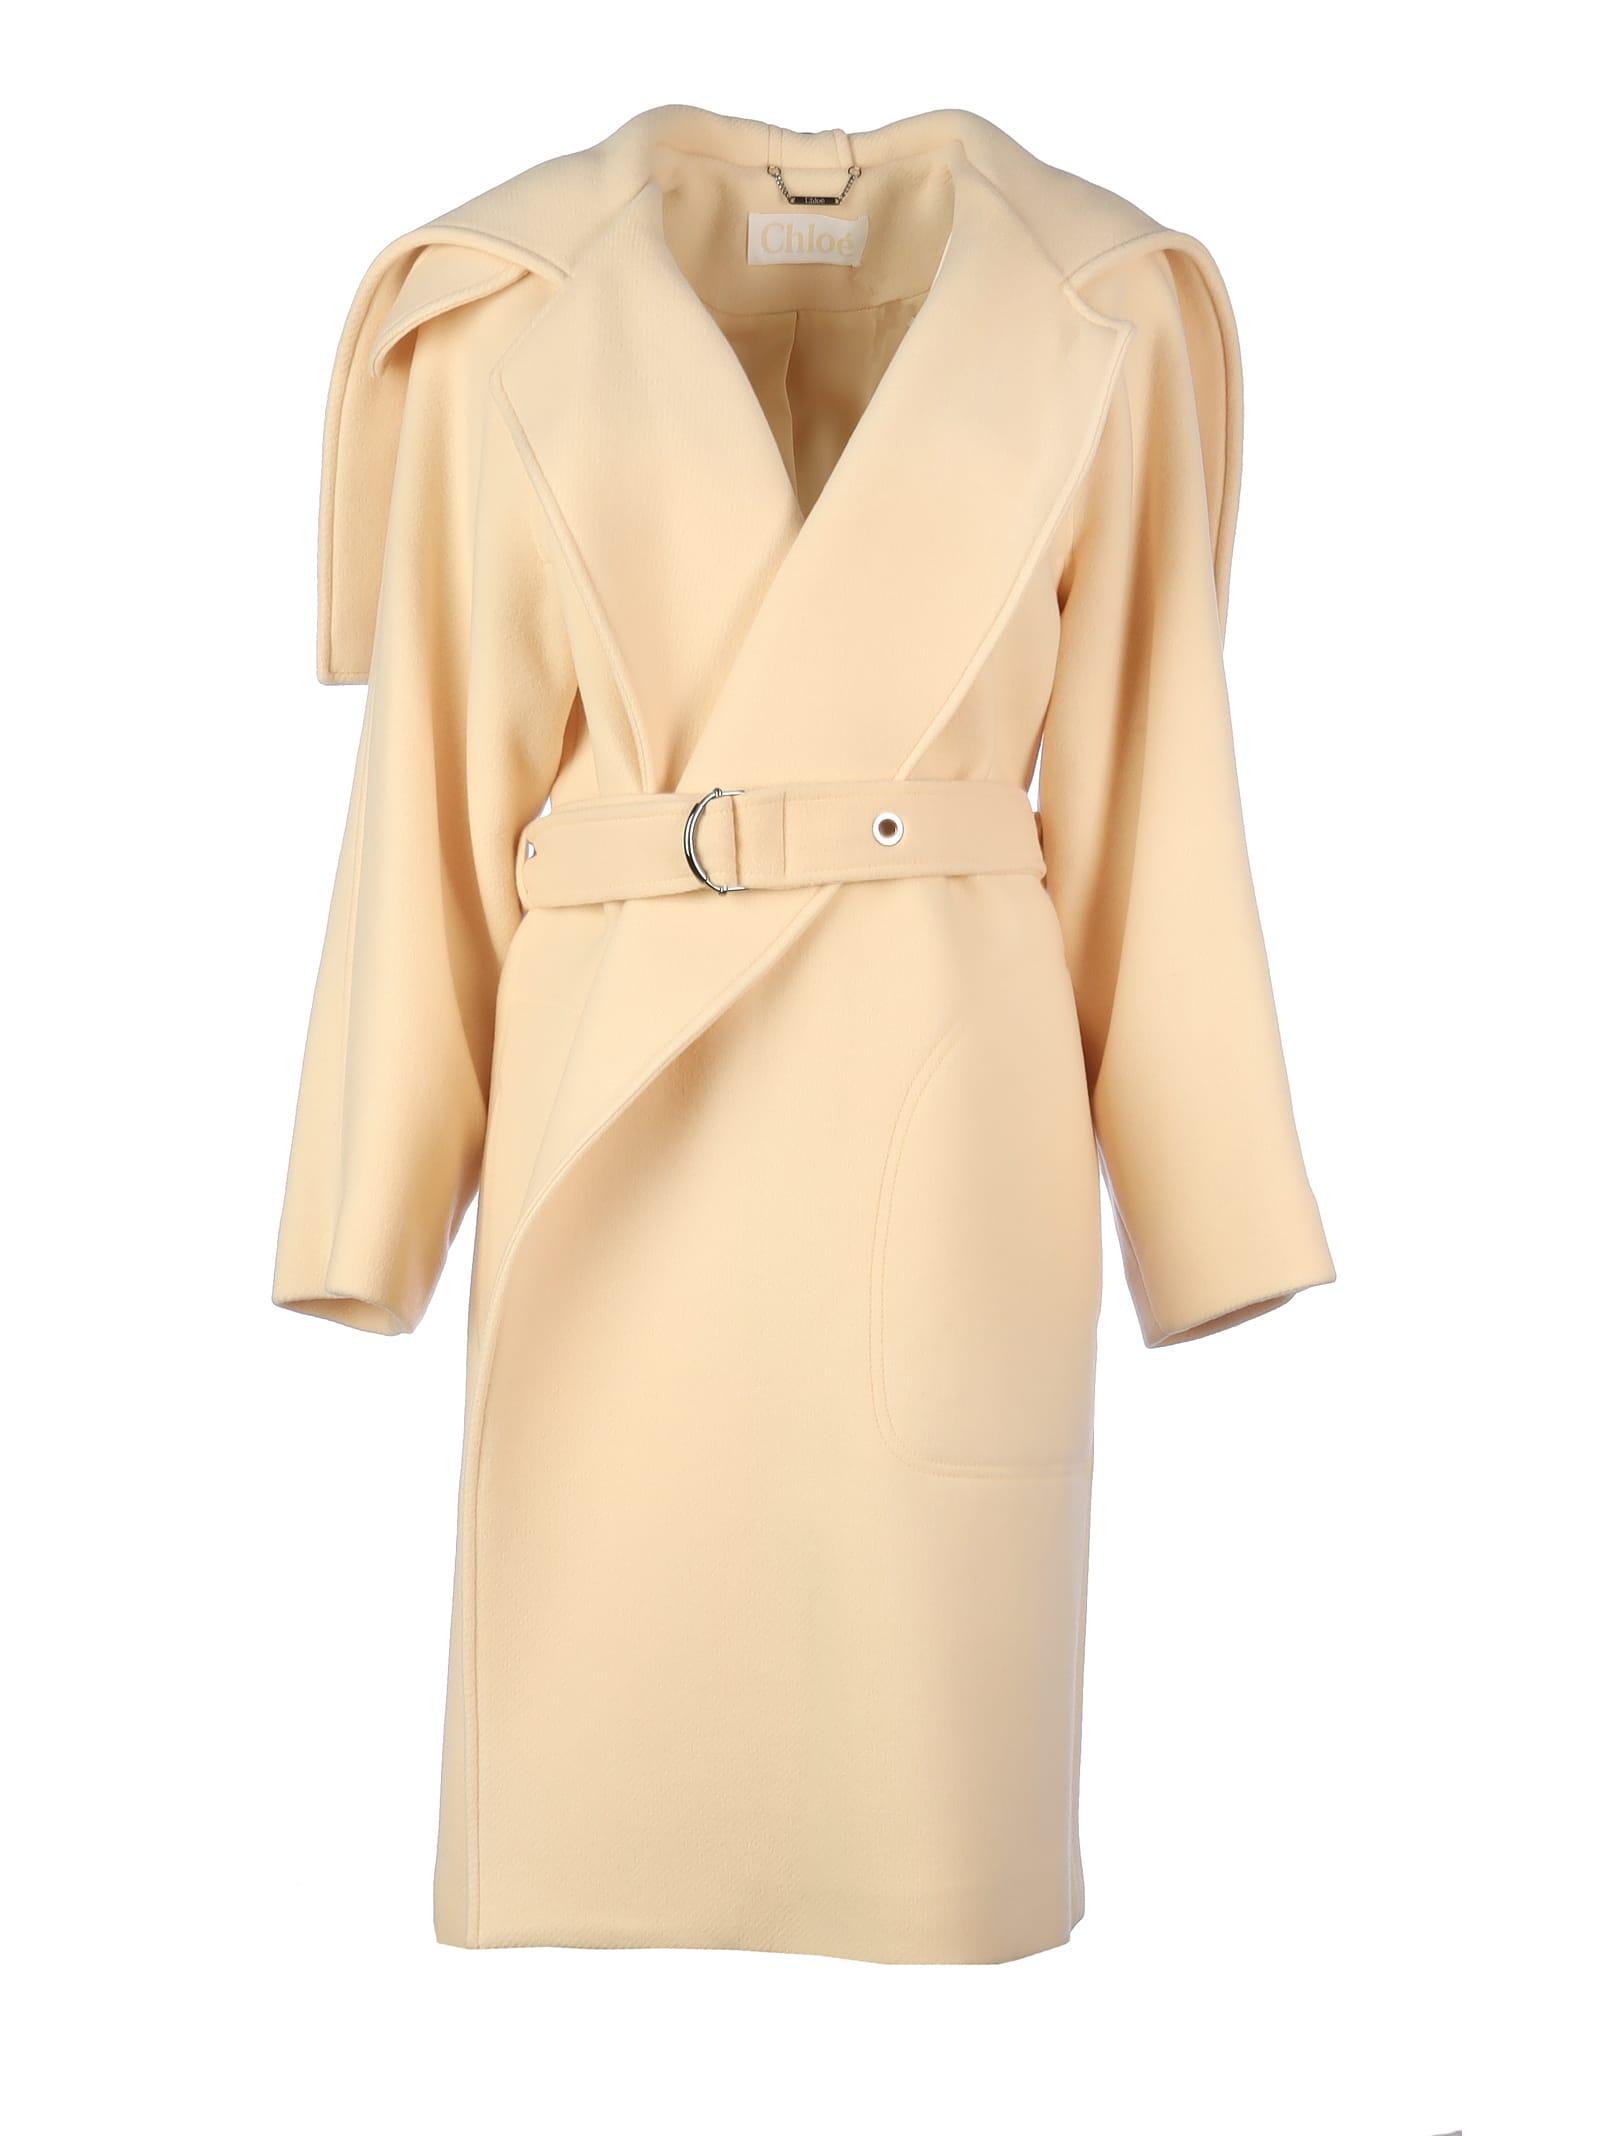 Chloé Wool Coat With Belt